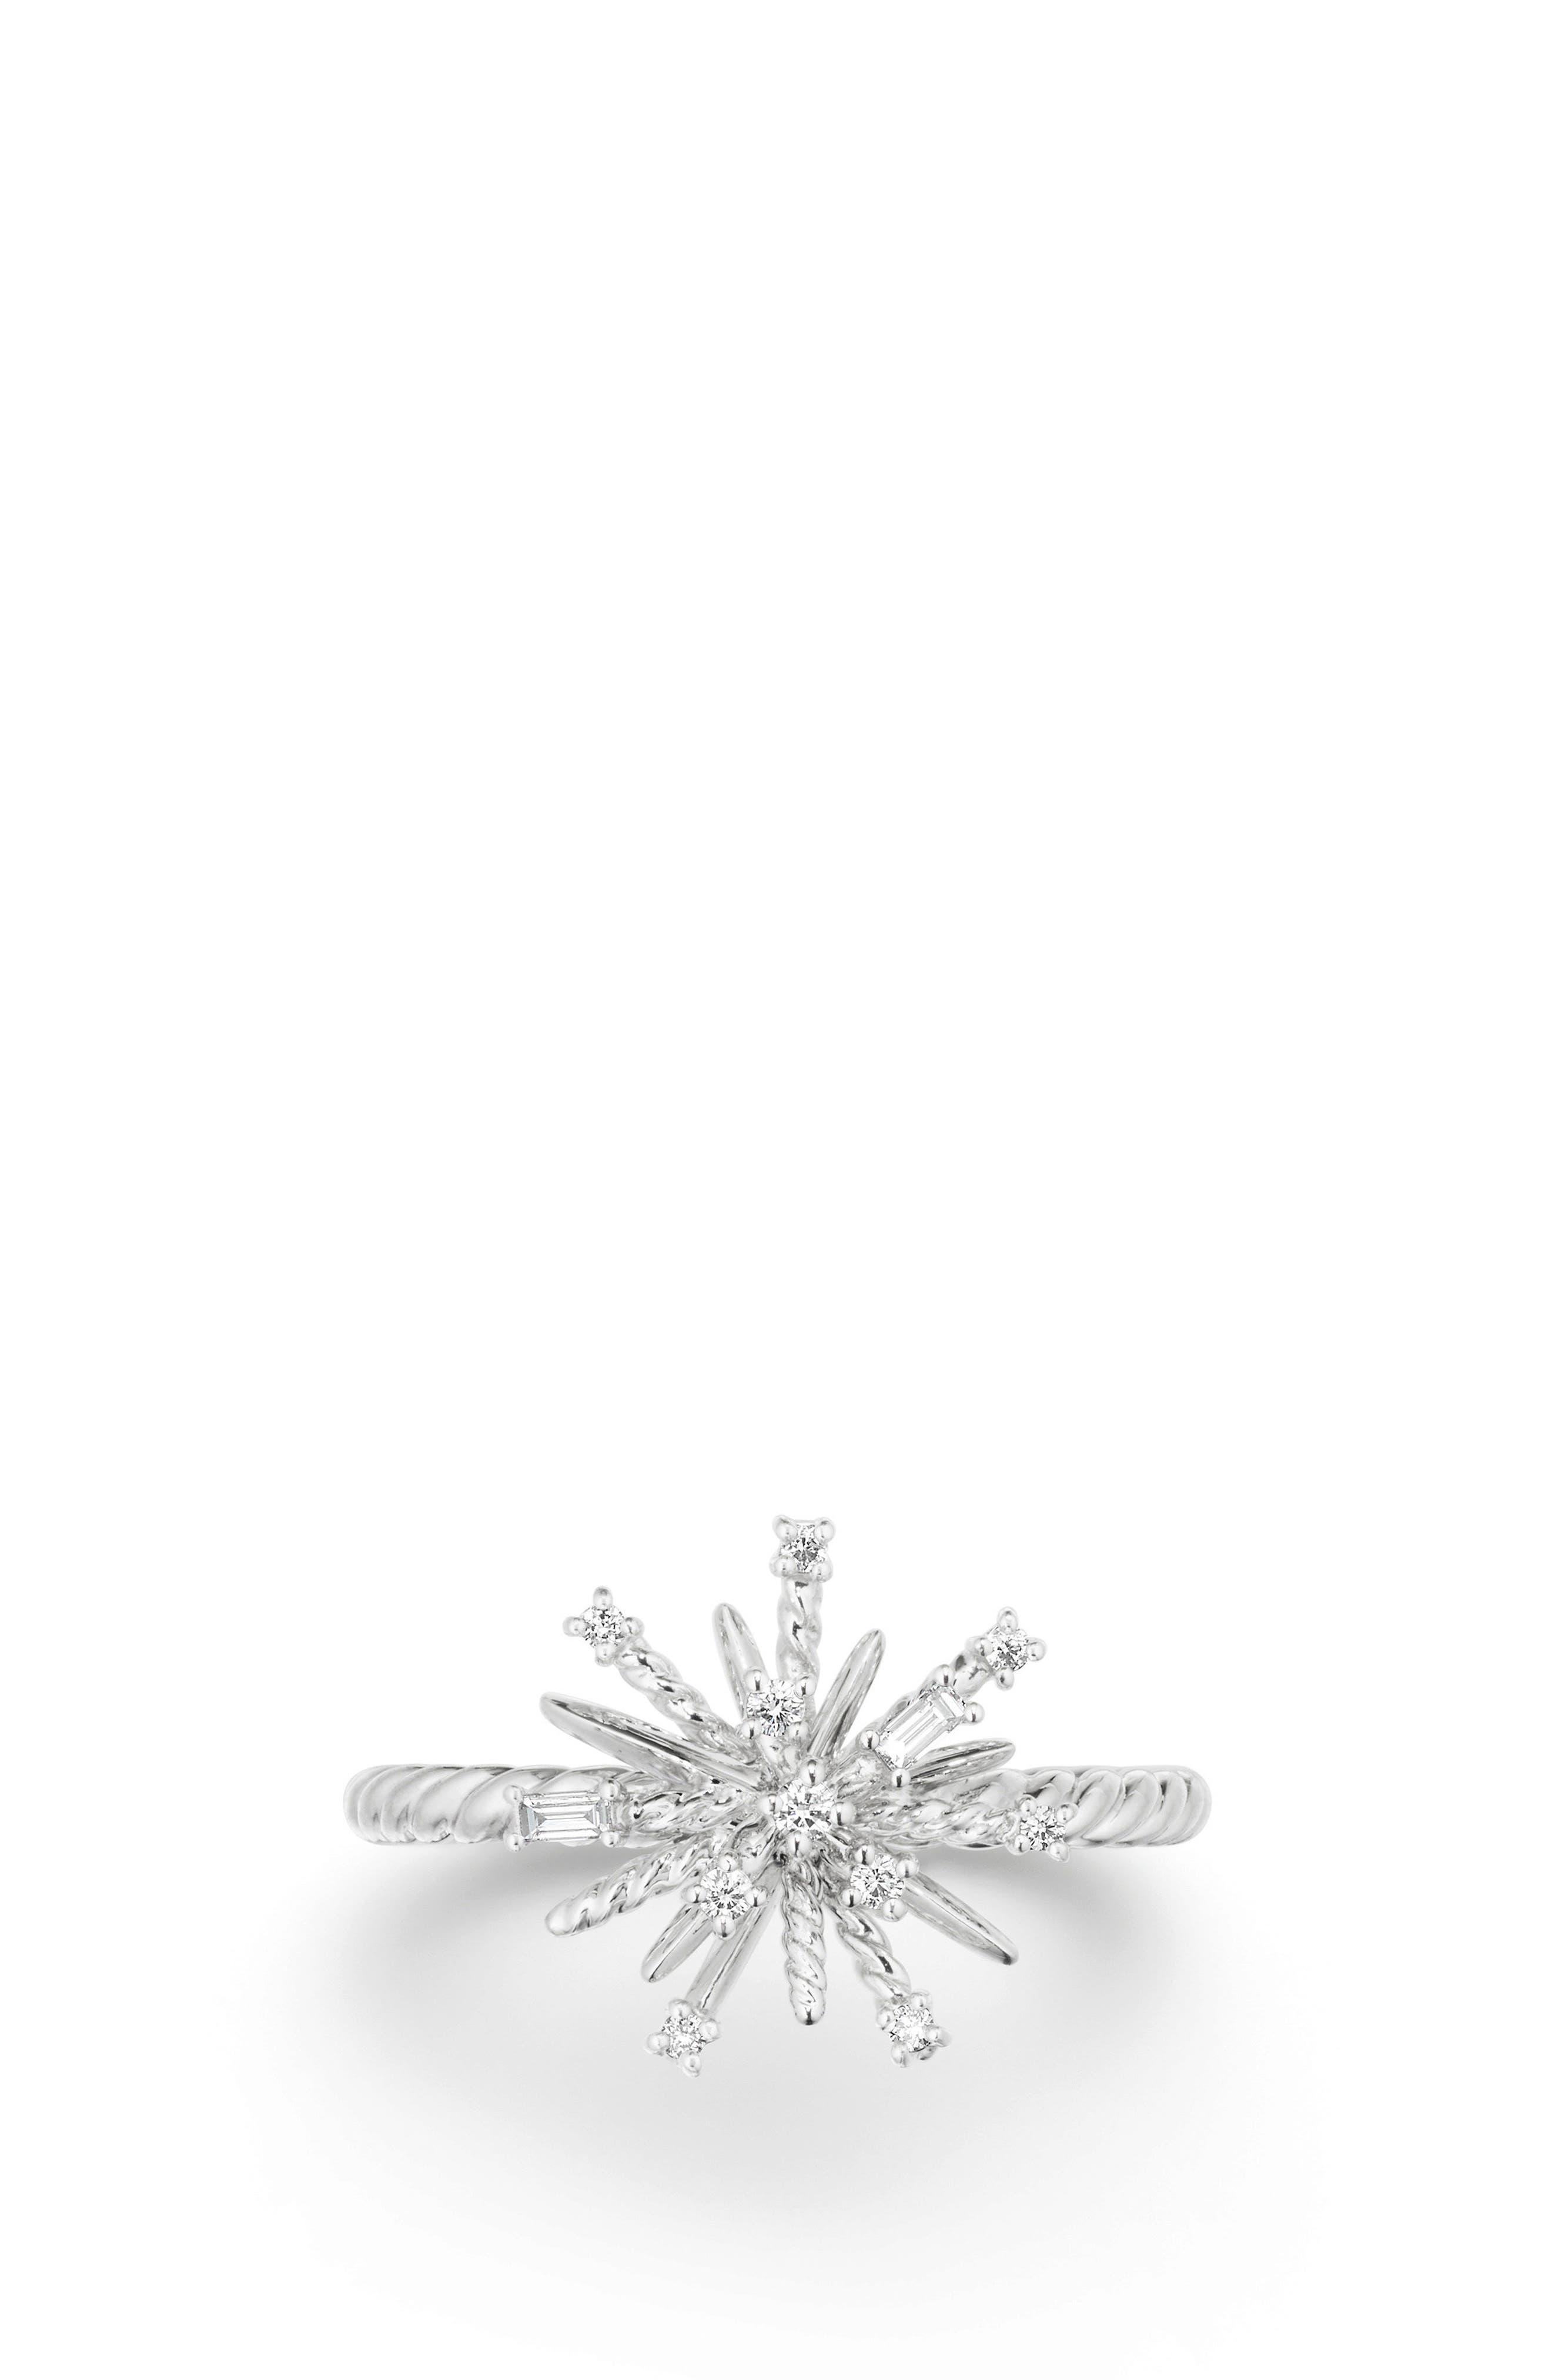 Supernova Ring with Diamonds,                             Alternate thumbnail 3, color,                             White Gold/ Diamond